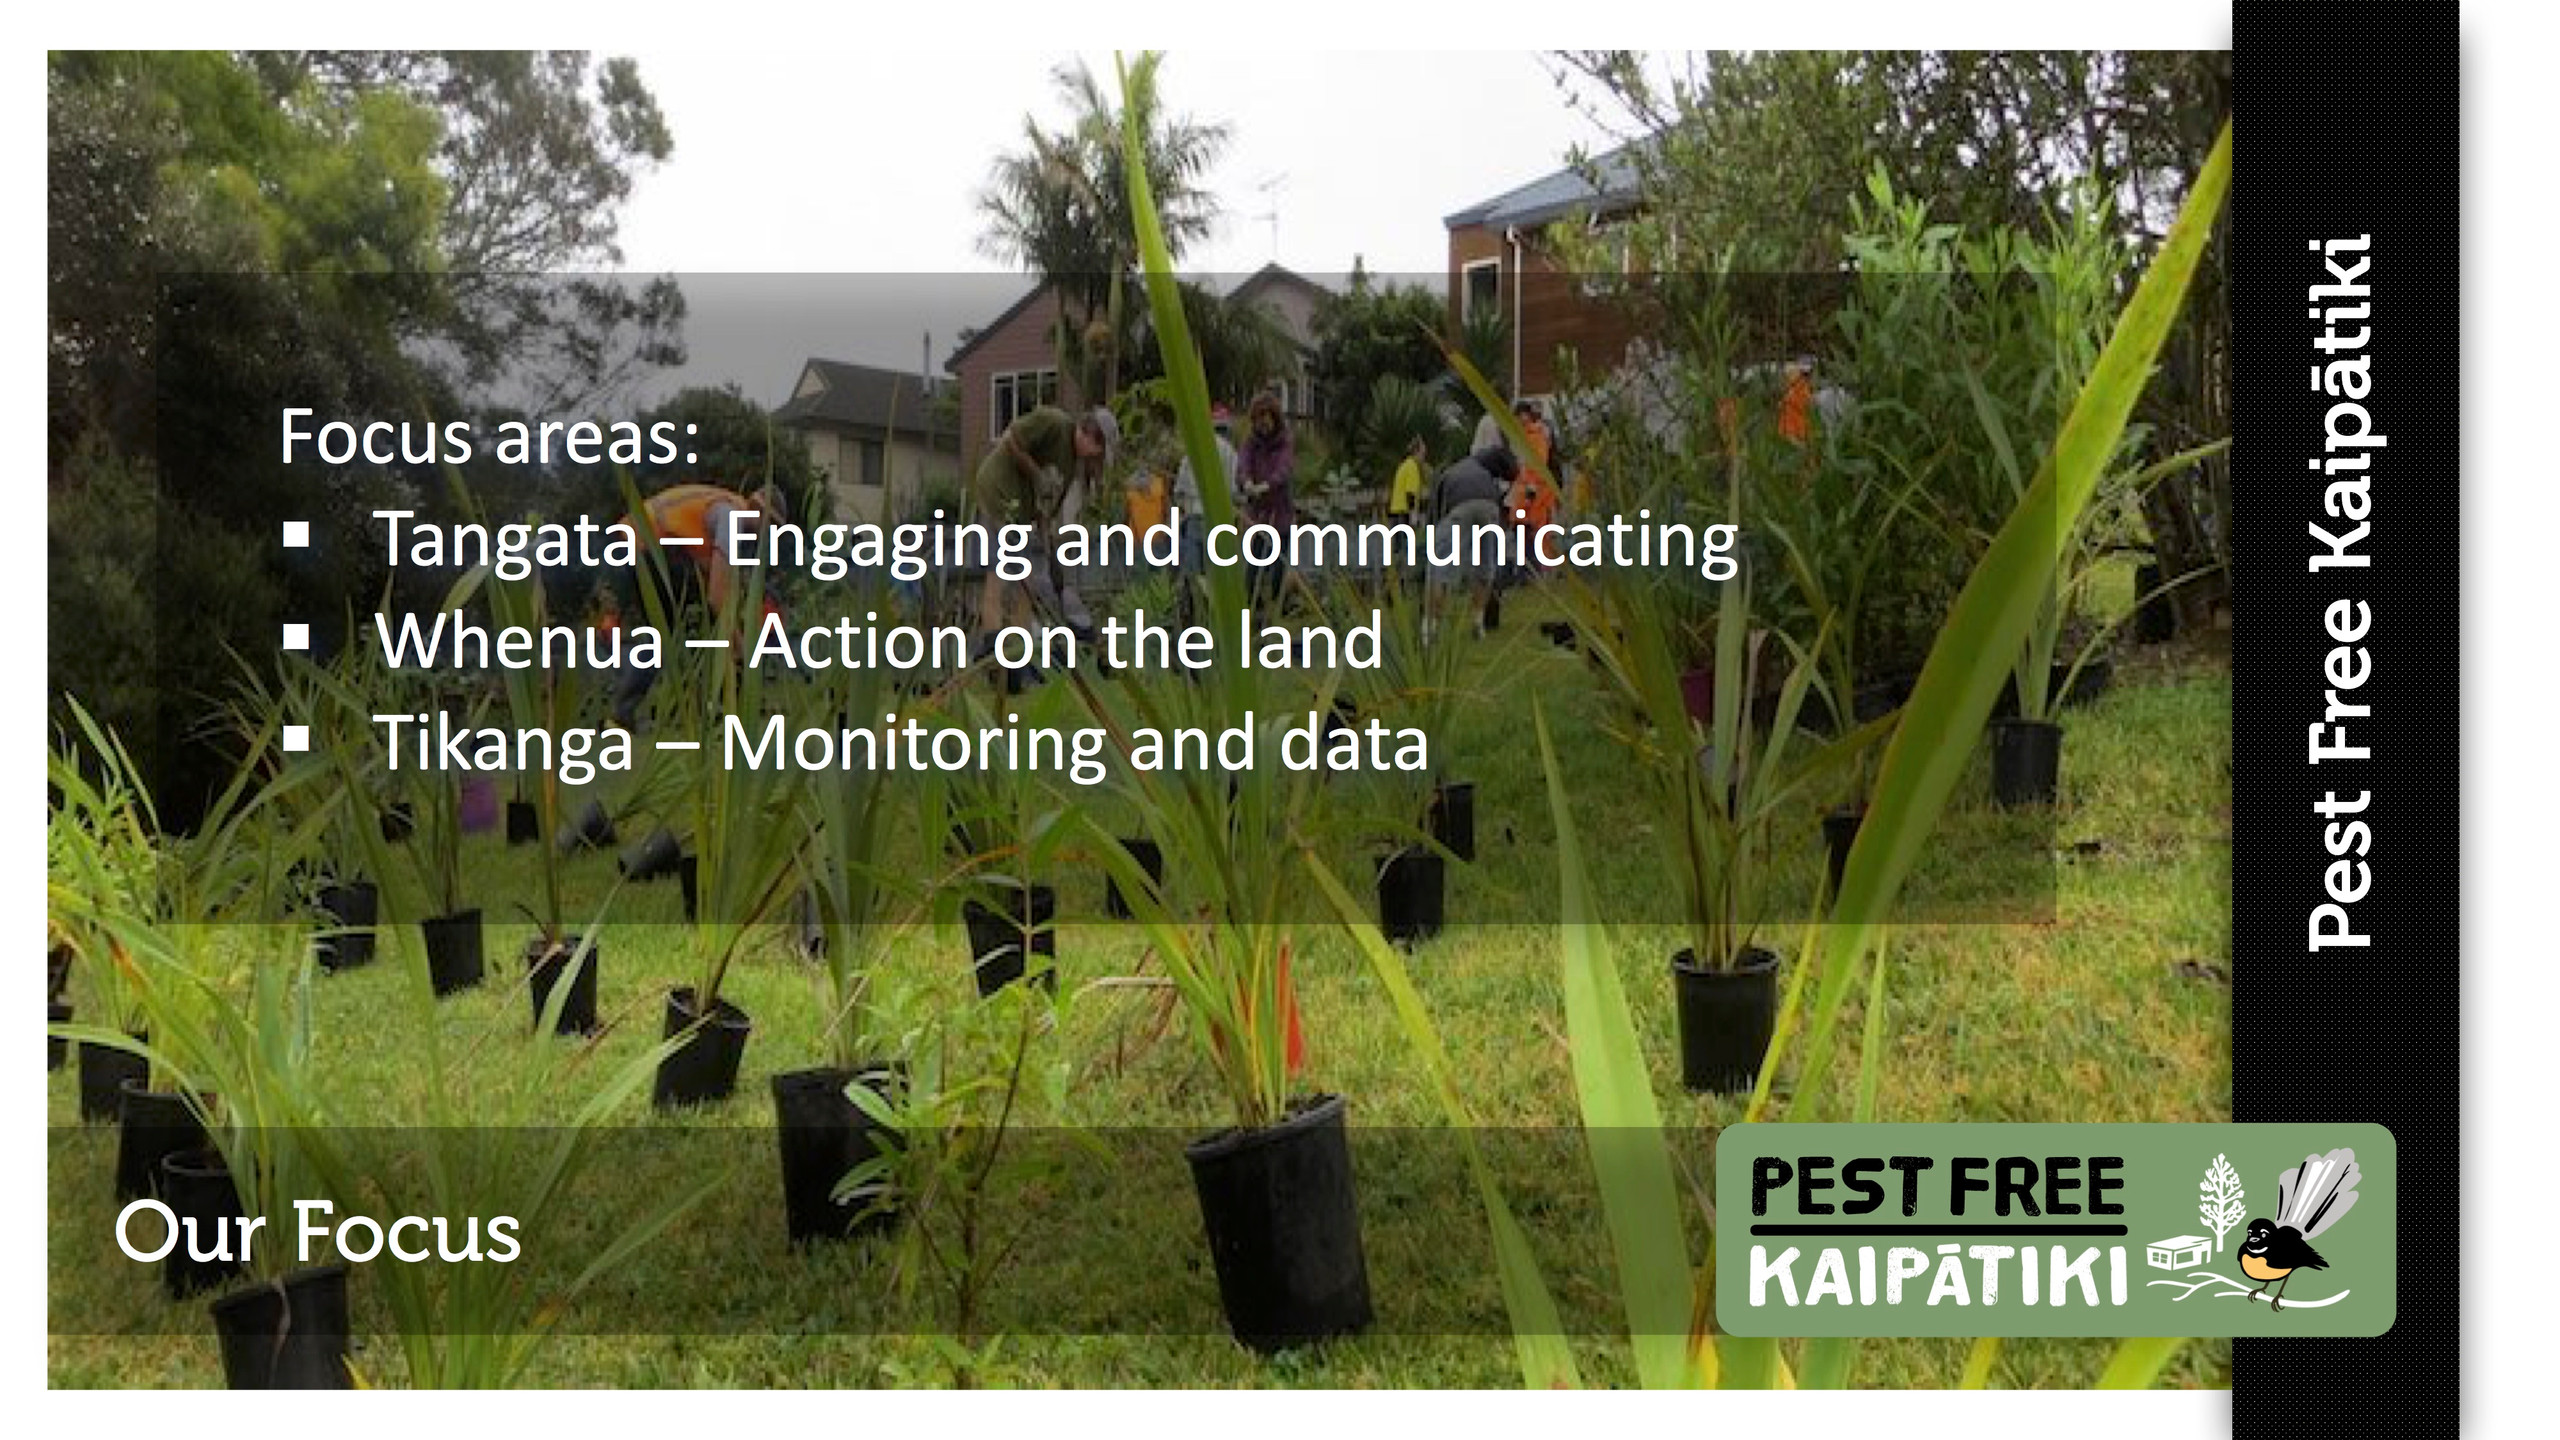 Pest Free Kaipatiki-Pestival-slide9